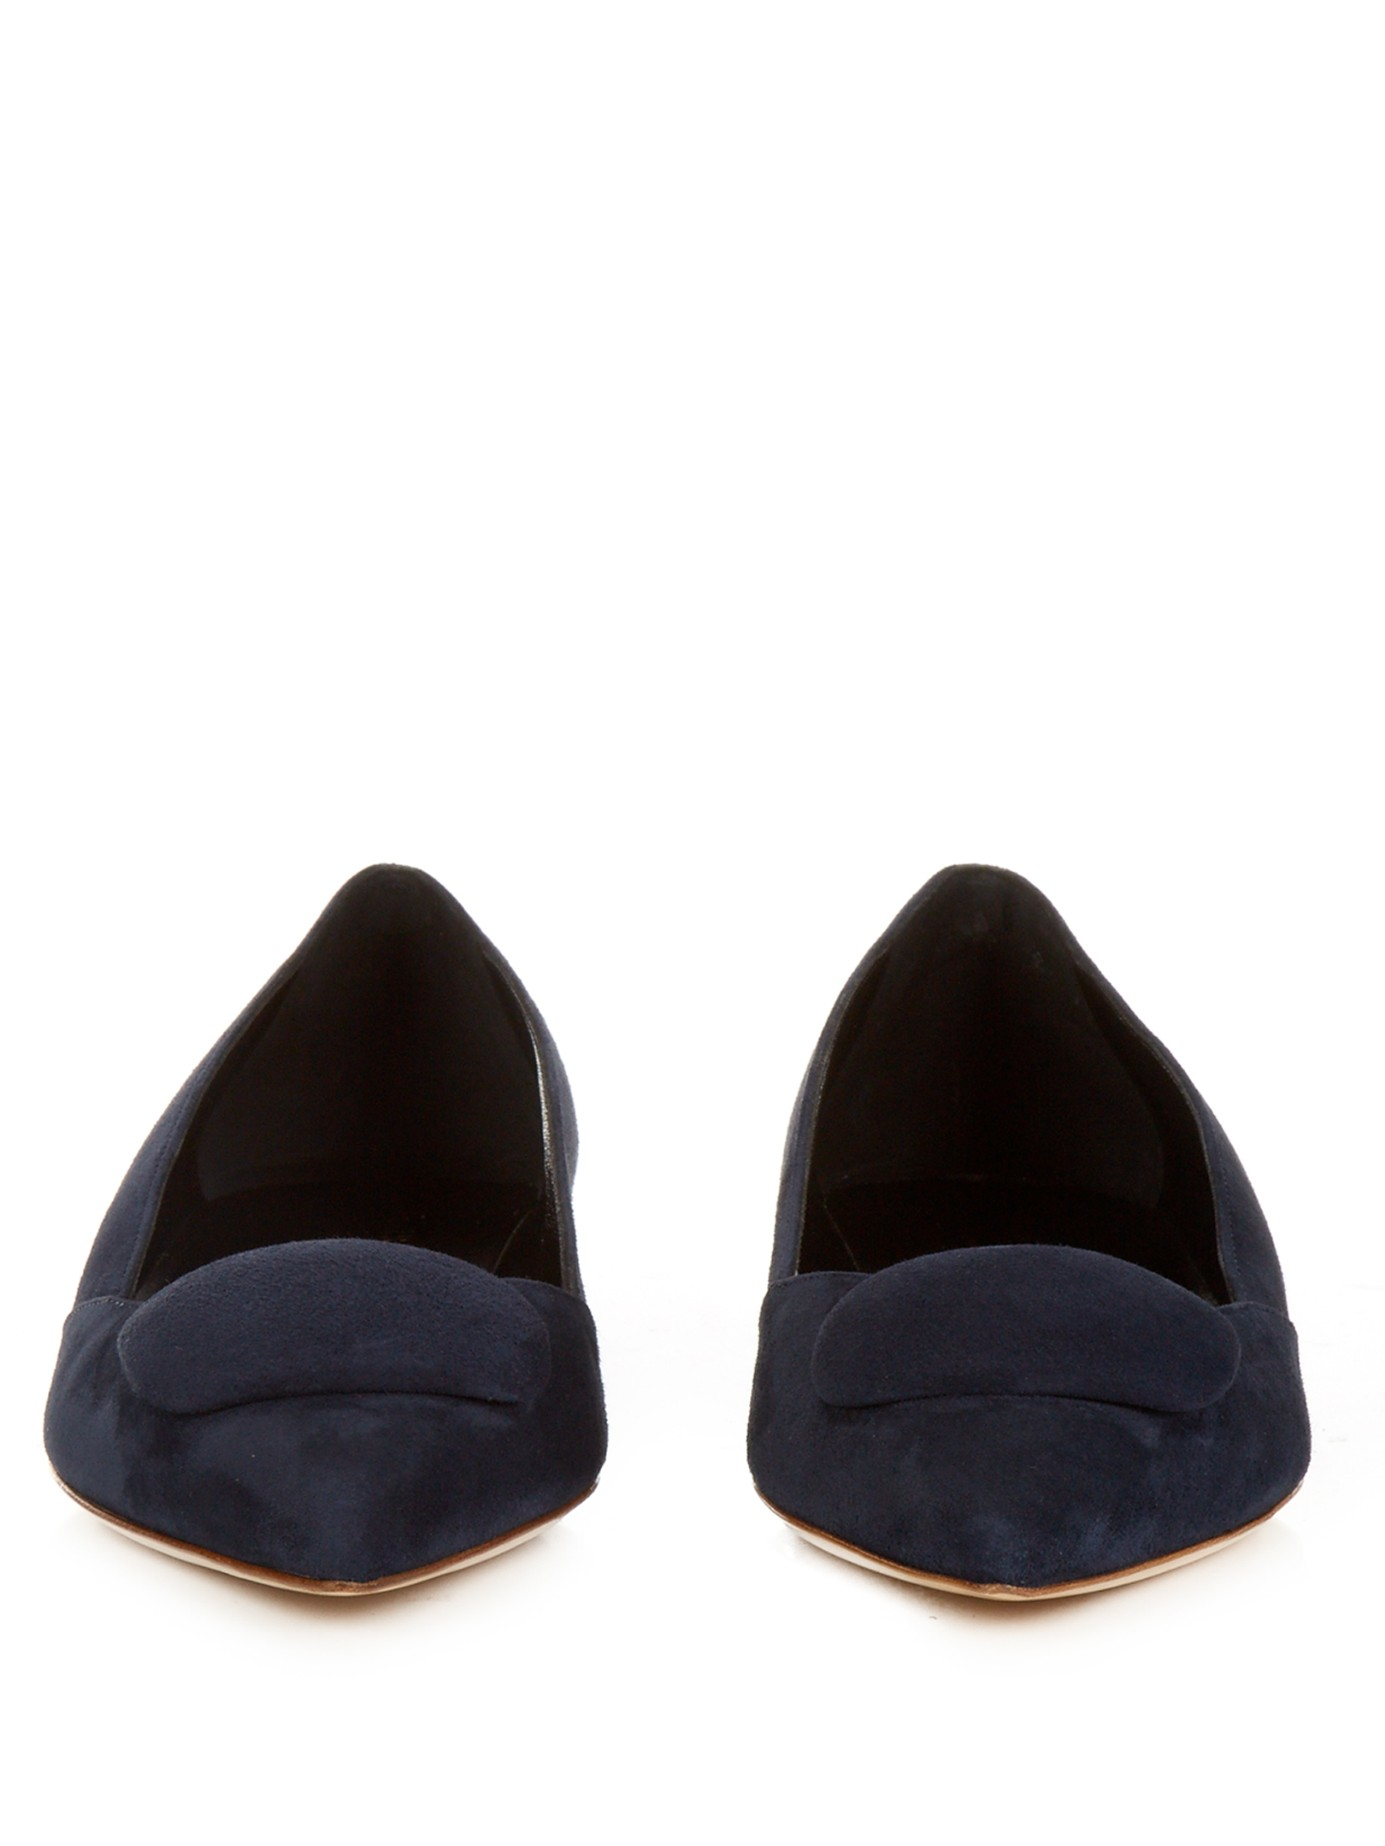 Rupert Sanderson Aga Suede Shoes